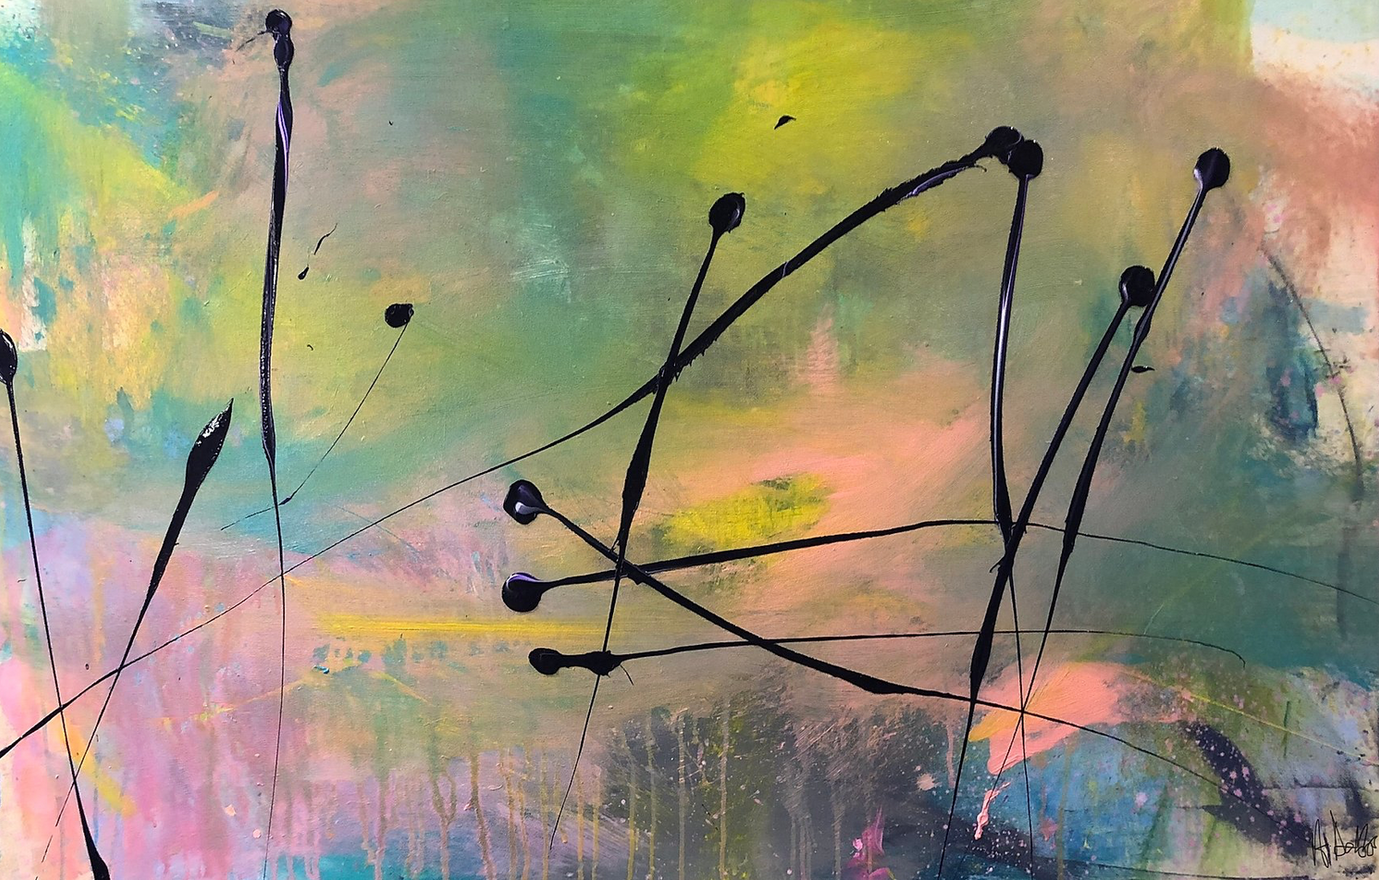 Alyssa Dabbs (b.1998). Reeds. Acrylic on canvas, 100 x 150 cm.